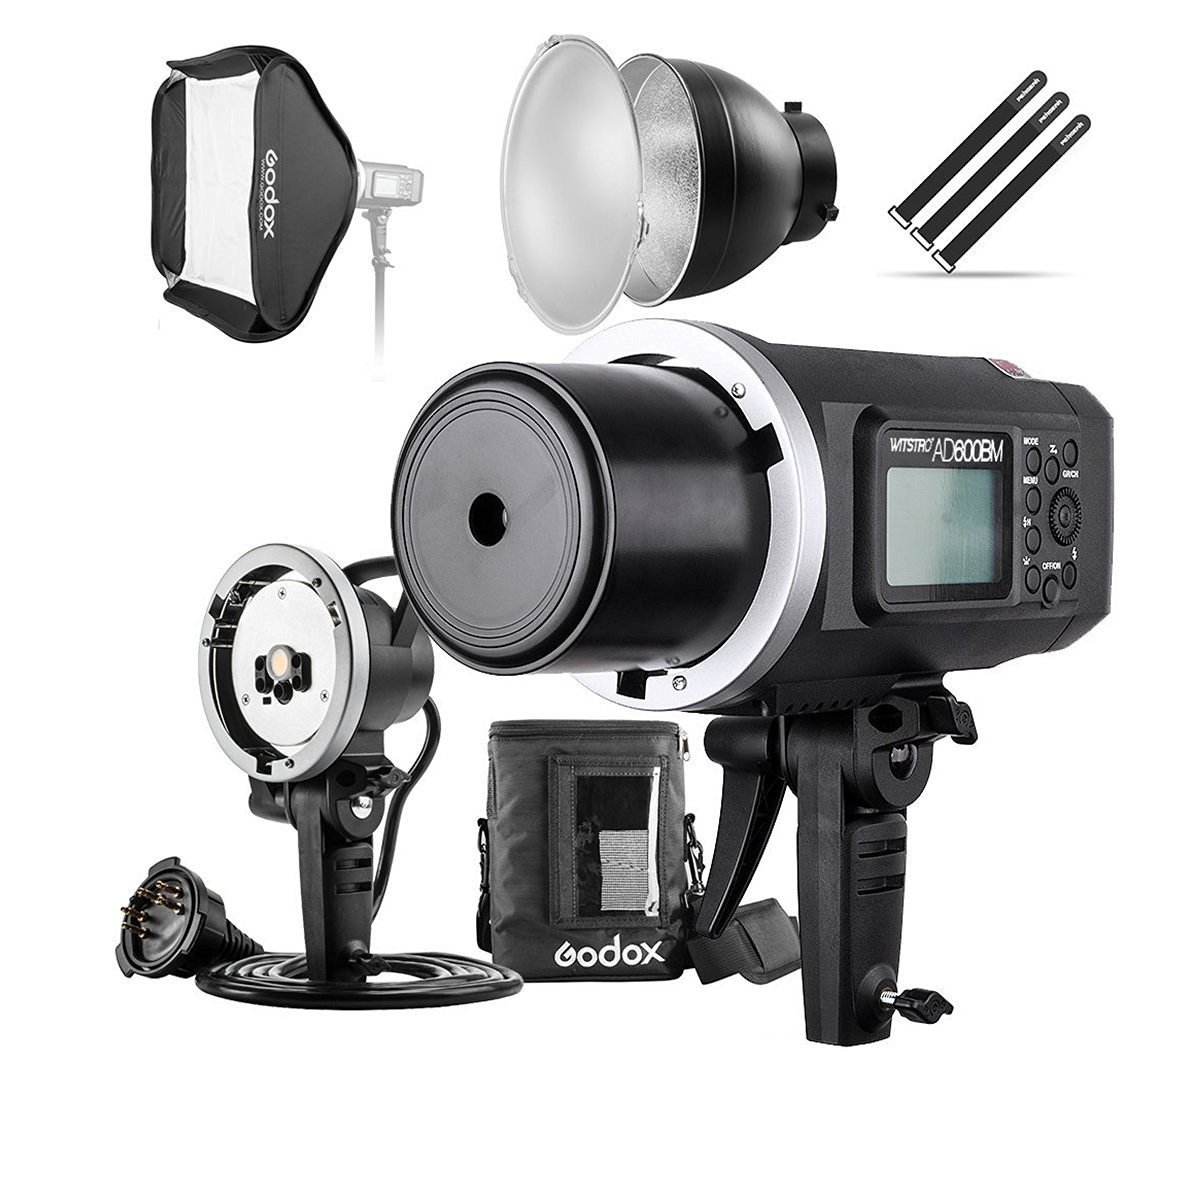 "Godox AD600BM 600Ws GN87 HSS Flash Strobe Monolight with 8700mAh Battery, 600W Portable Lamp Flash Head, 23""X23"" Flash Softbox, 7"" Standard Reflector, 7"" Flash Diffuser and Portable Flash Bag"